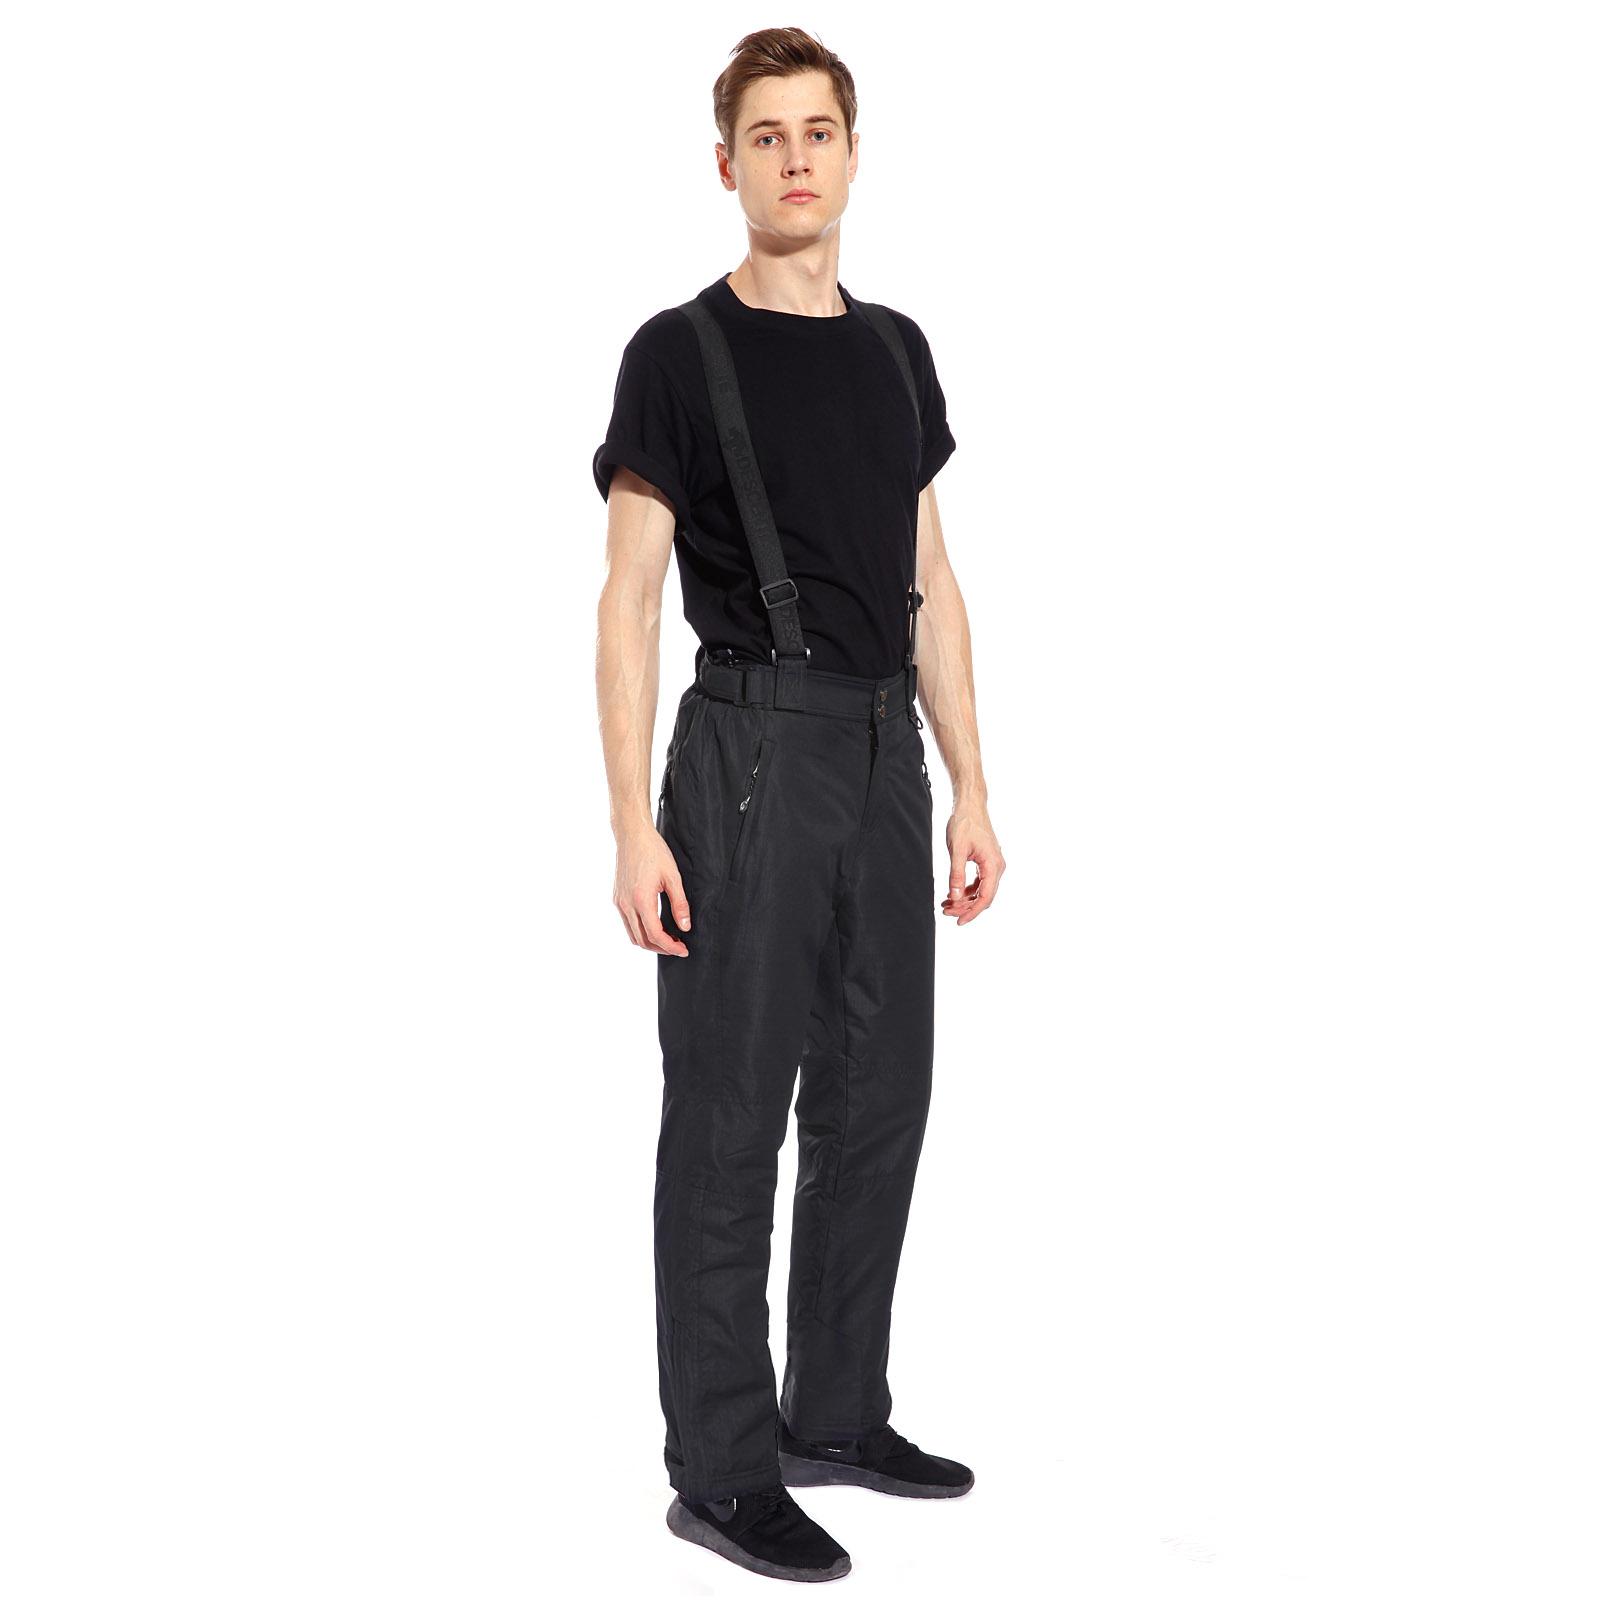 fe672791a Black Mens Ski Pants Waterproof Trousers Detachable Braces Multiple ...